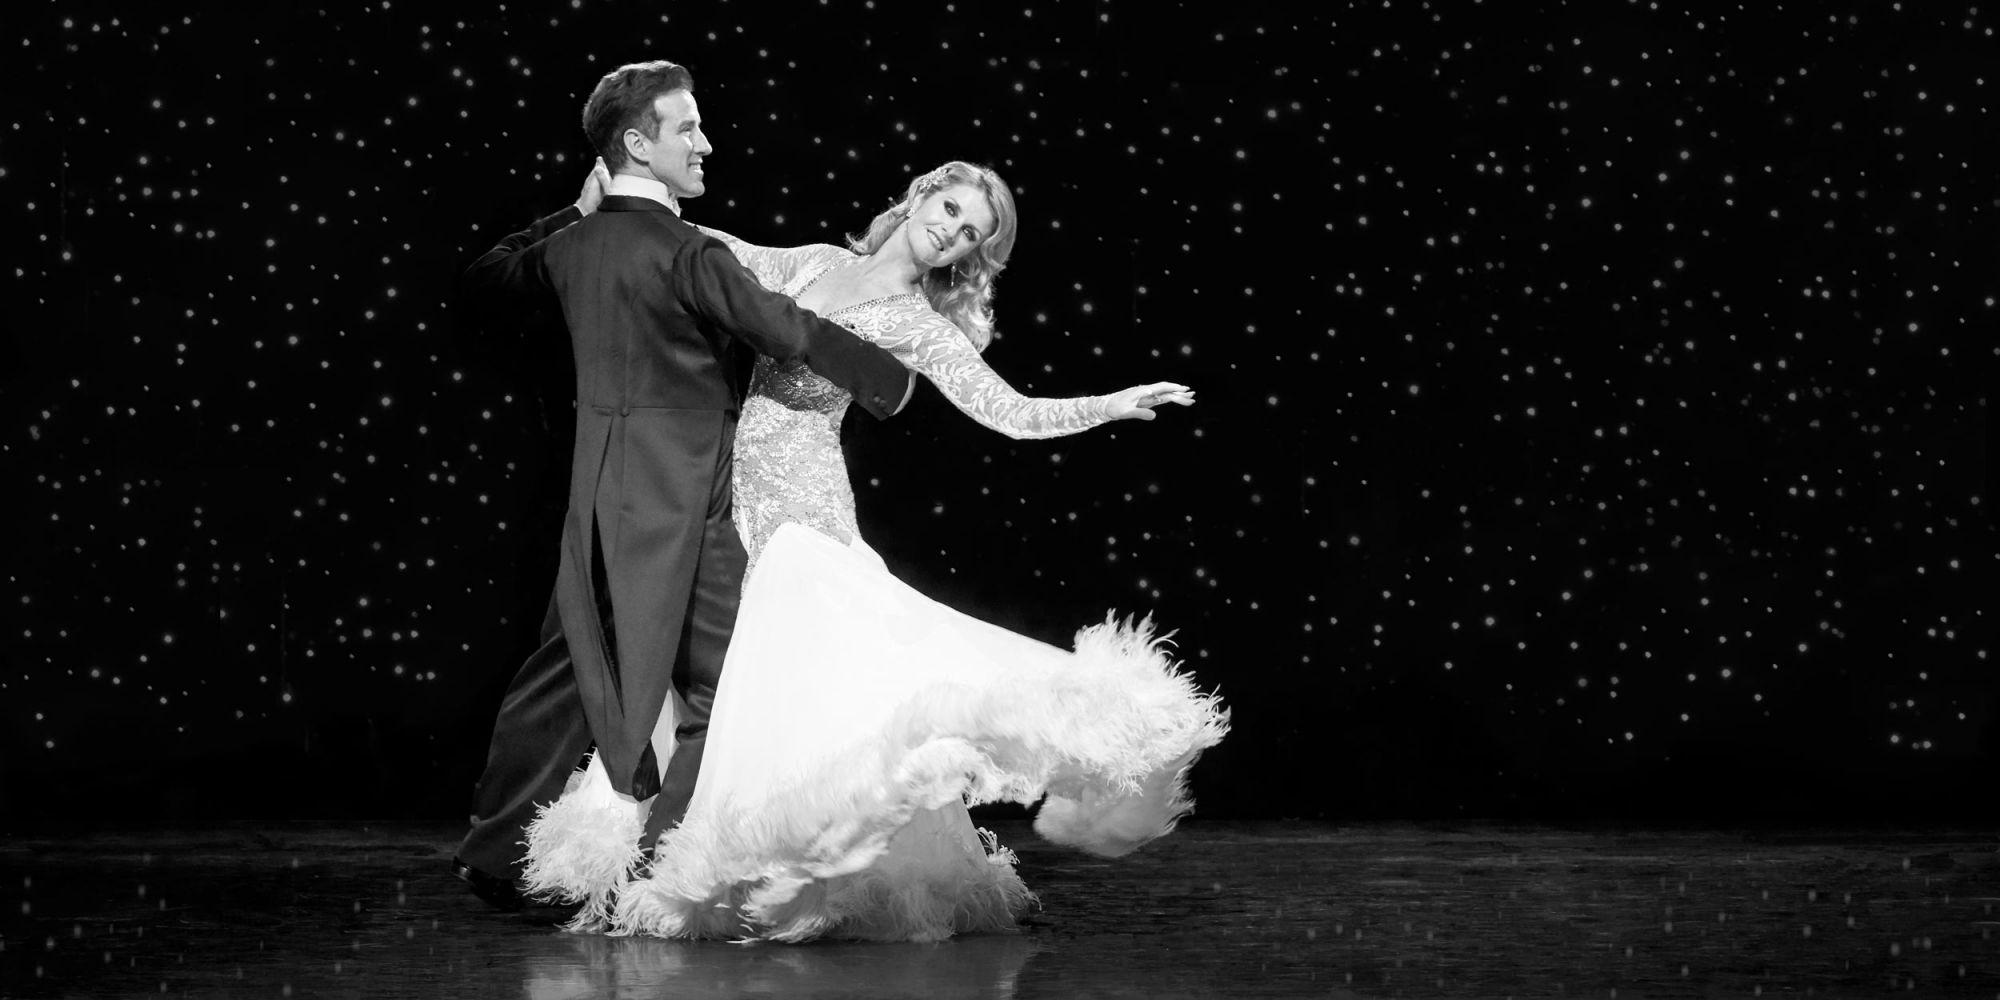 Anton & Erin: Broadway To Hollywood